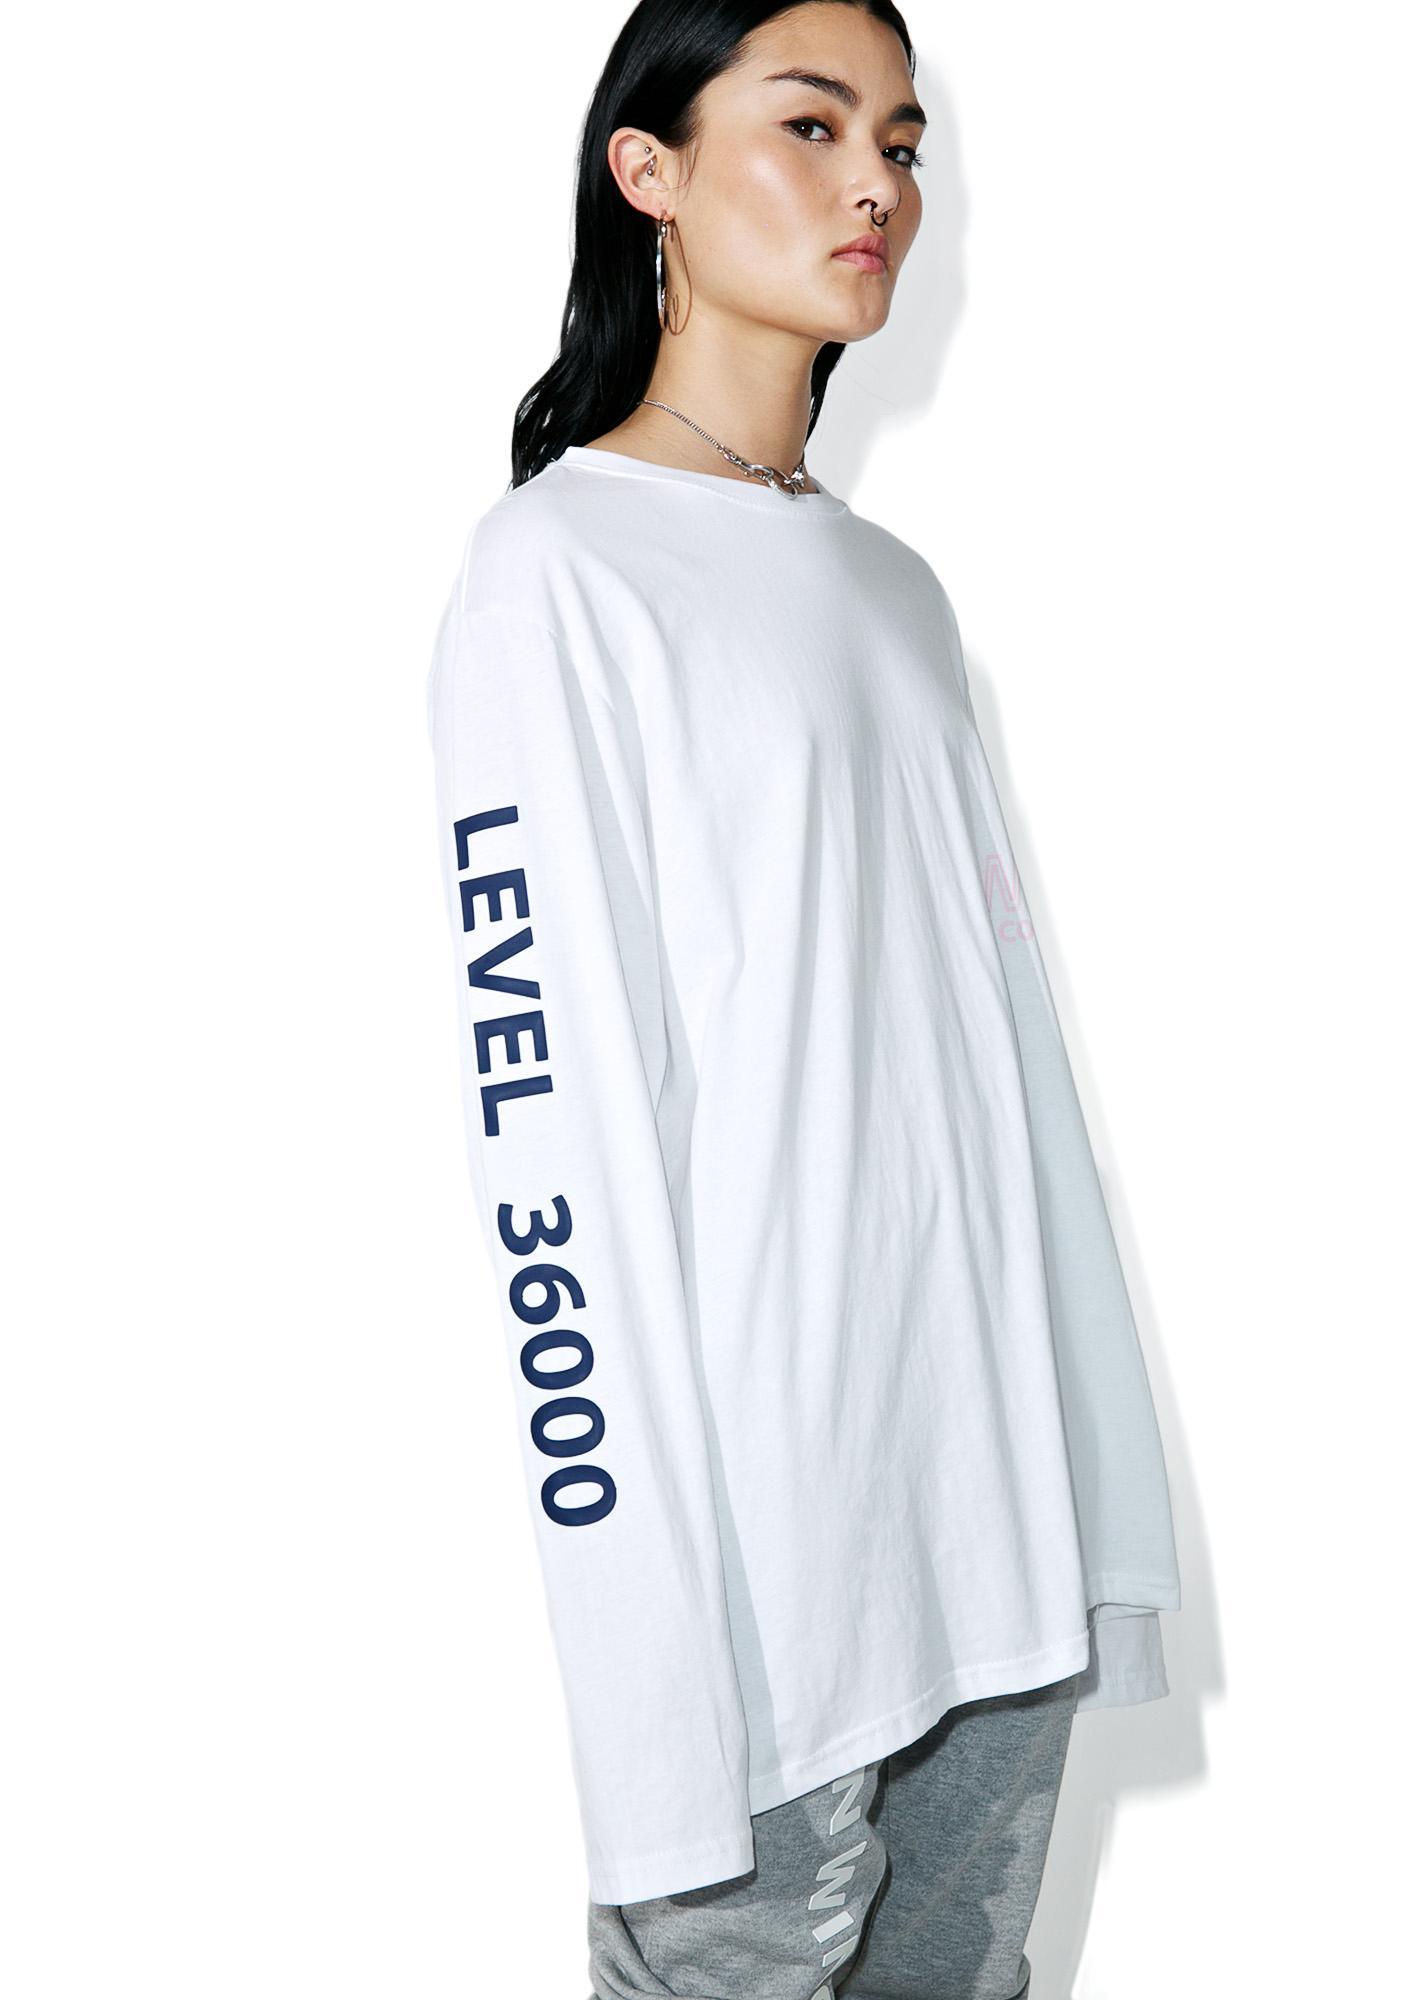 W.I.A Level 36000 Long Sleeve Tee